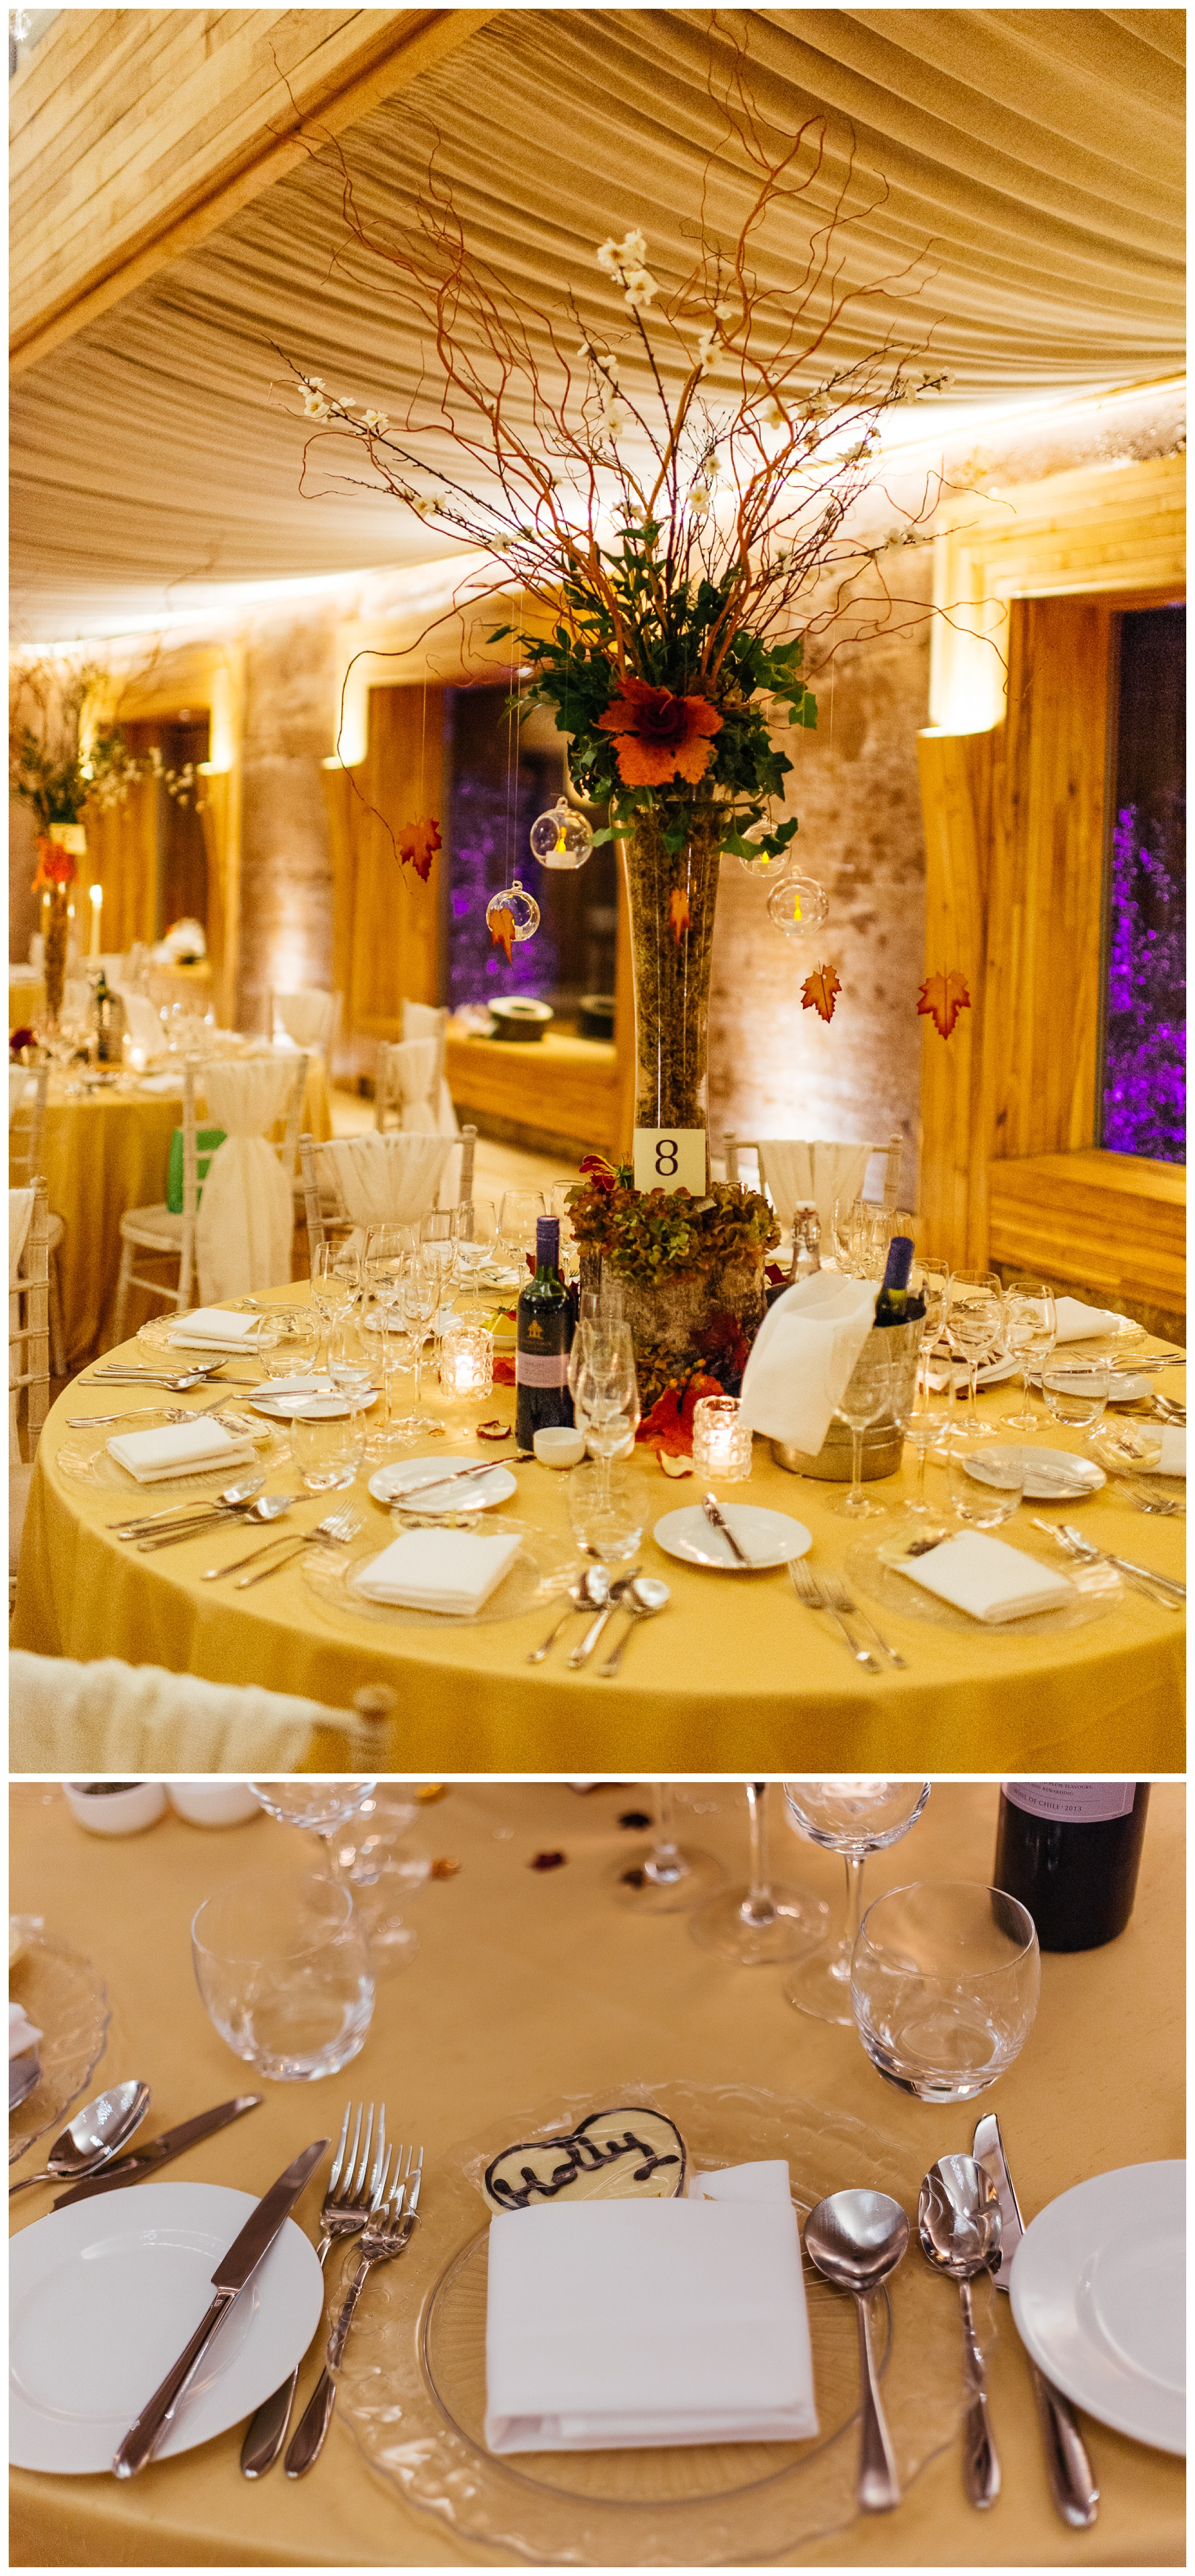 Emma&Paul-Elmore-Court-Winter-Wedding-Nikki-Cooper-Photography_0088.jpg